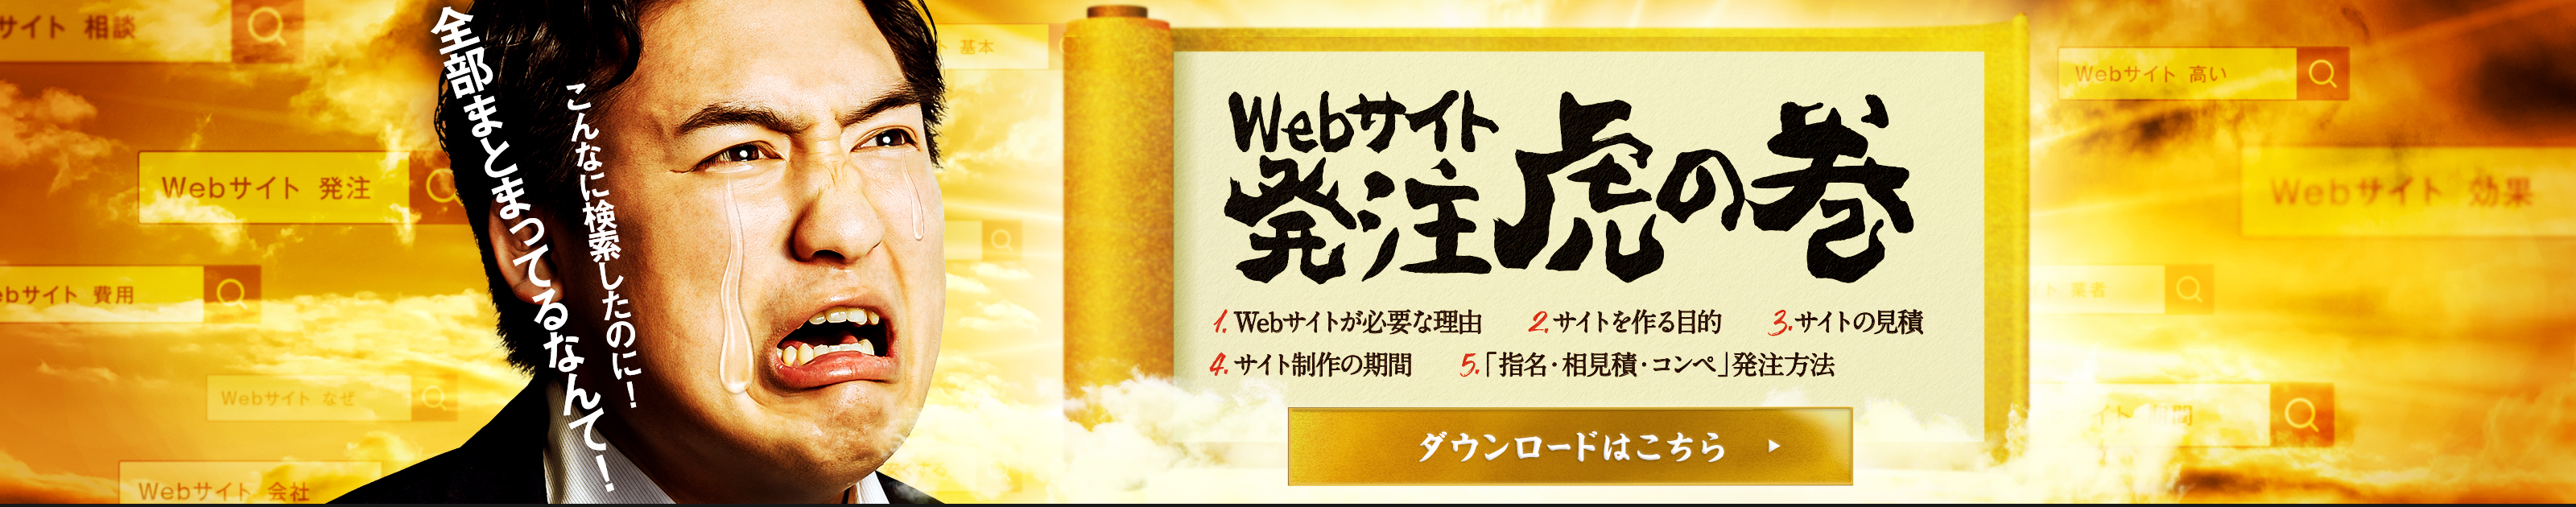 Webサイト発注虎の巻ダウンロード